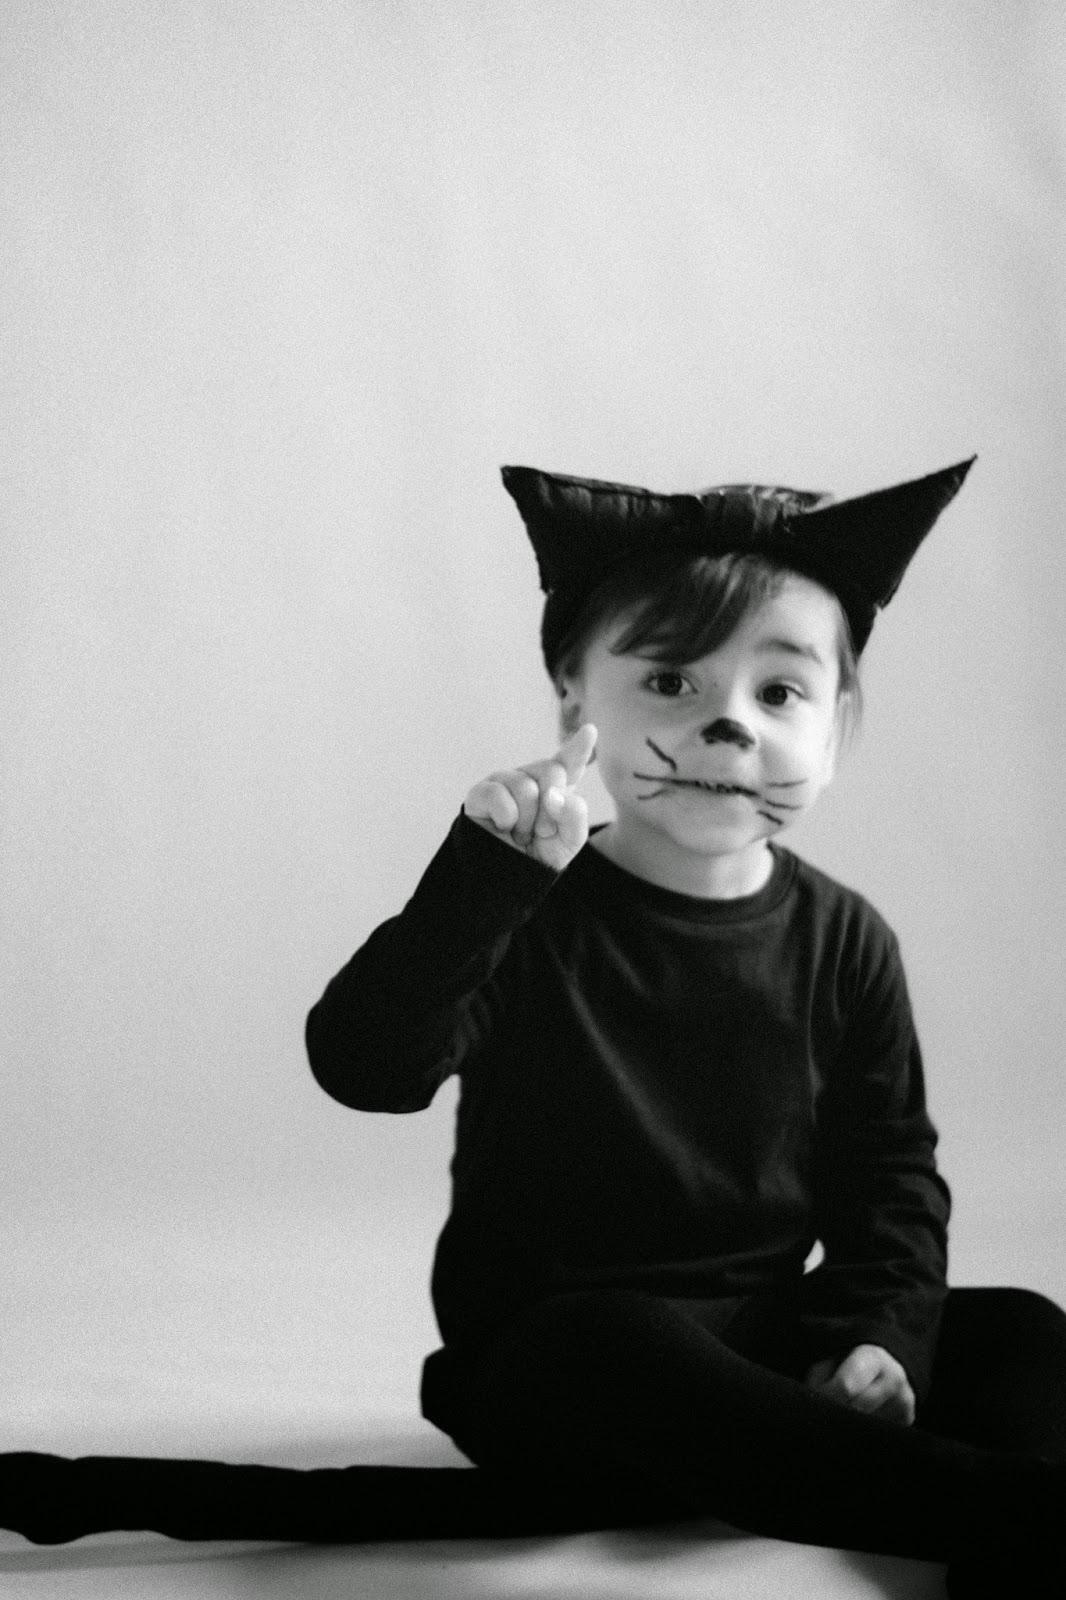 Disfraz de gato fácil